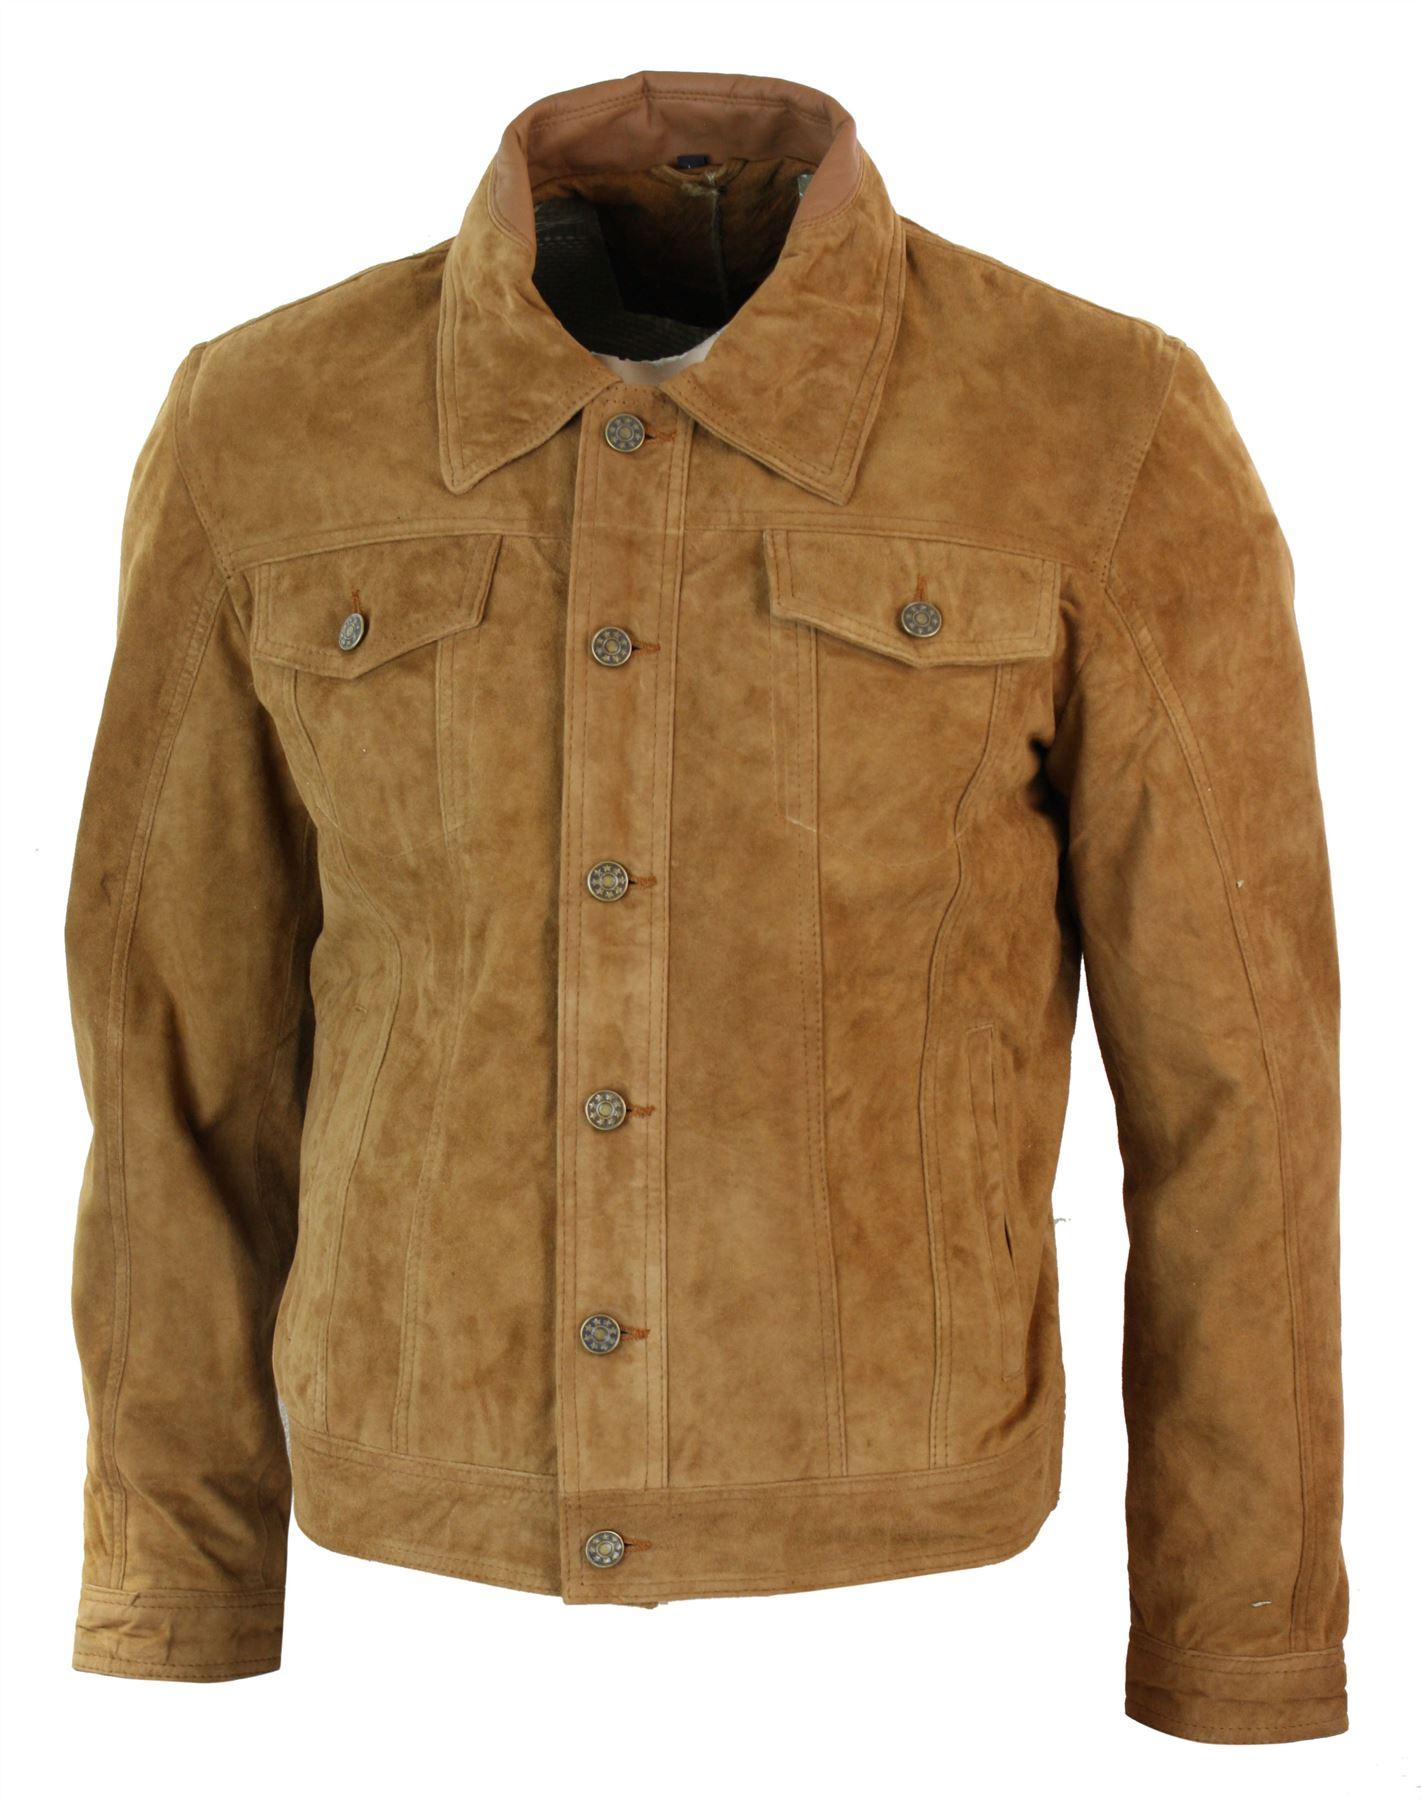 Mens Vintage Short Denim Style Retro Real Suede Leather ...